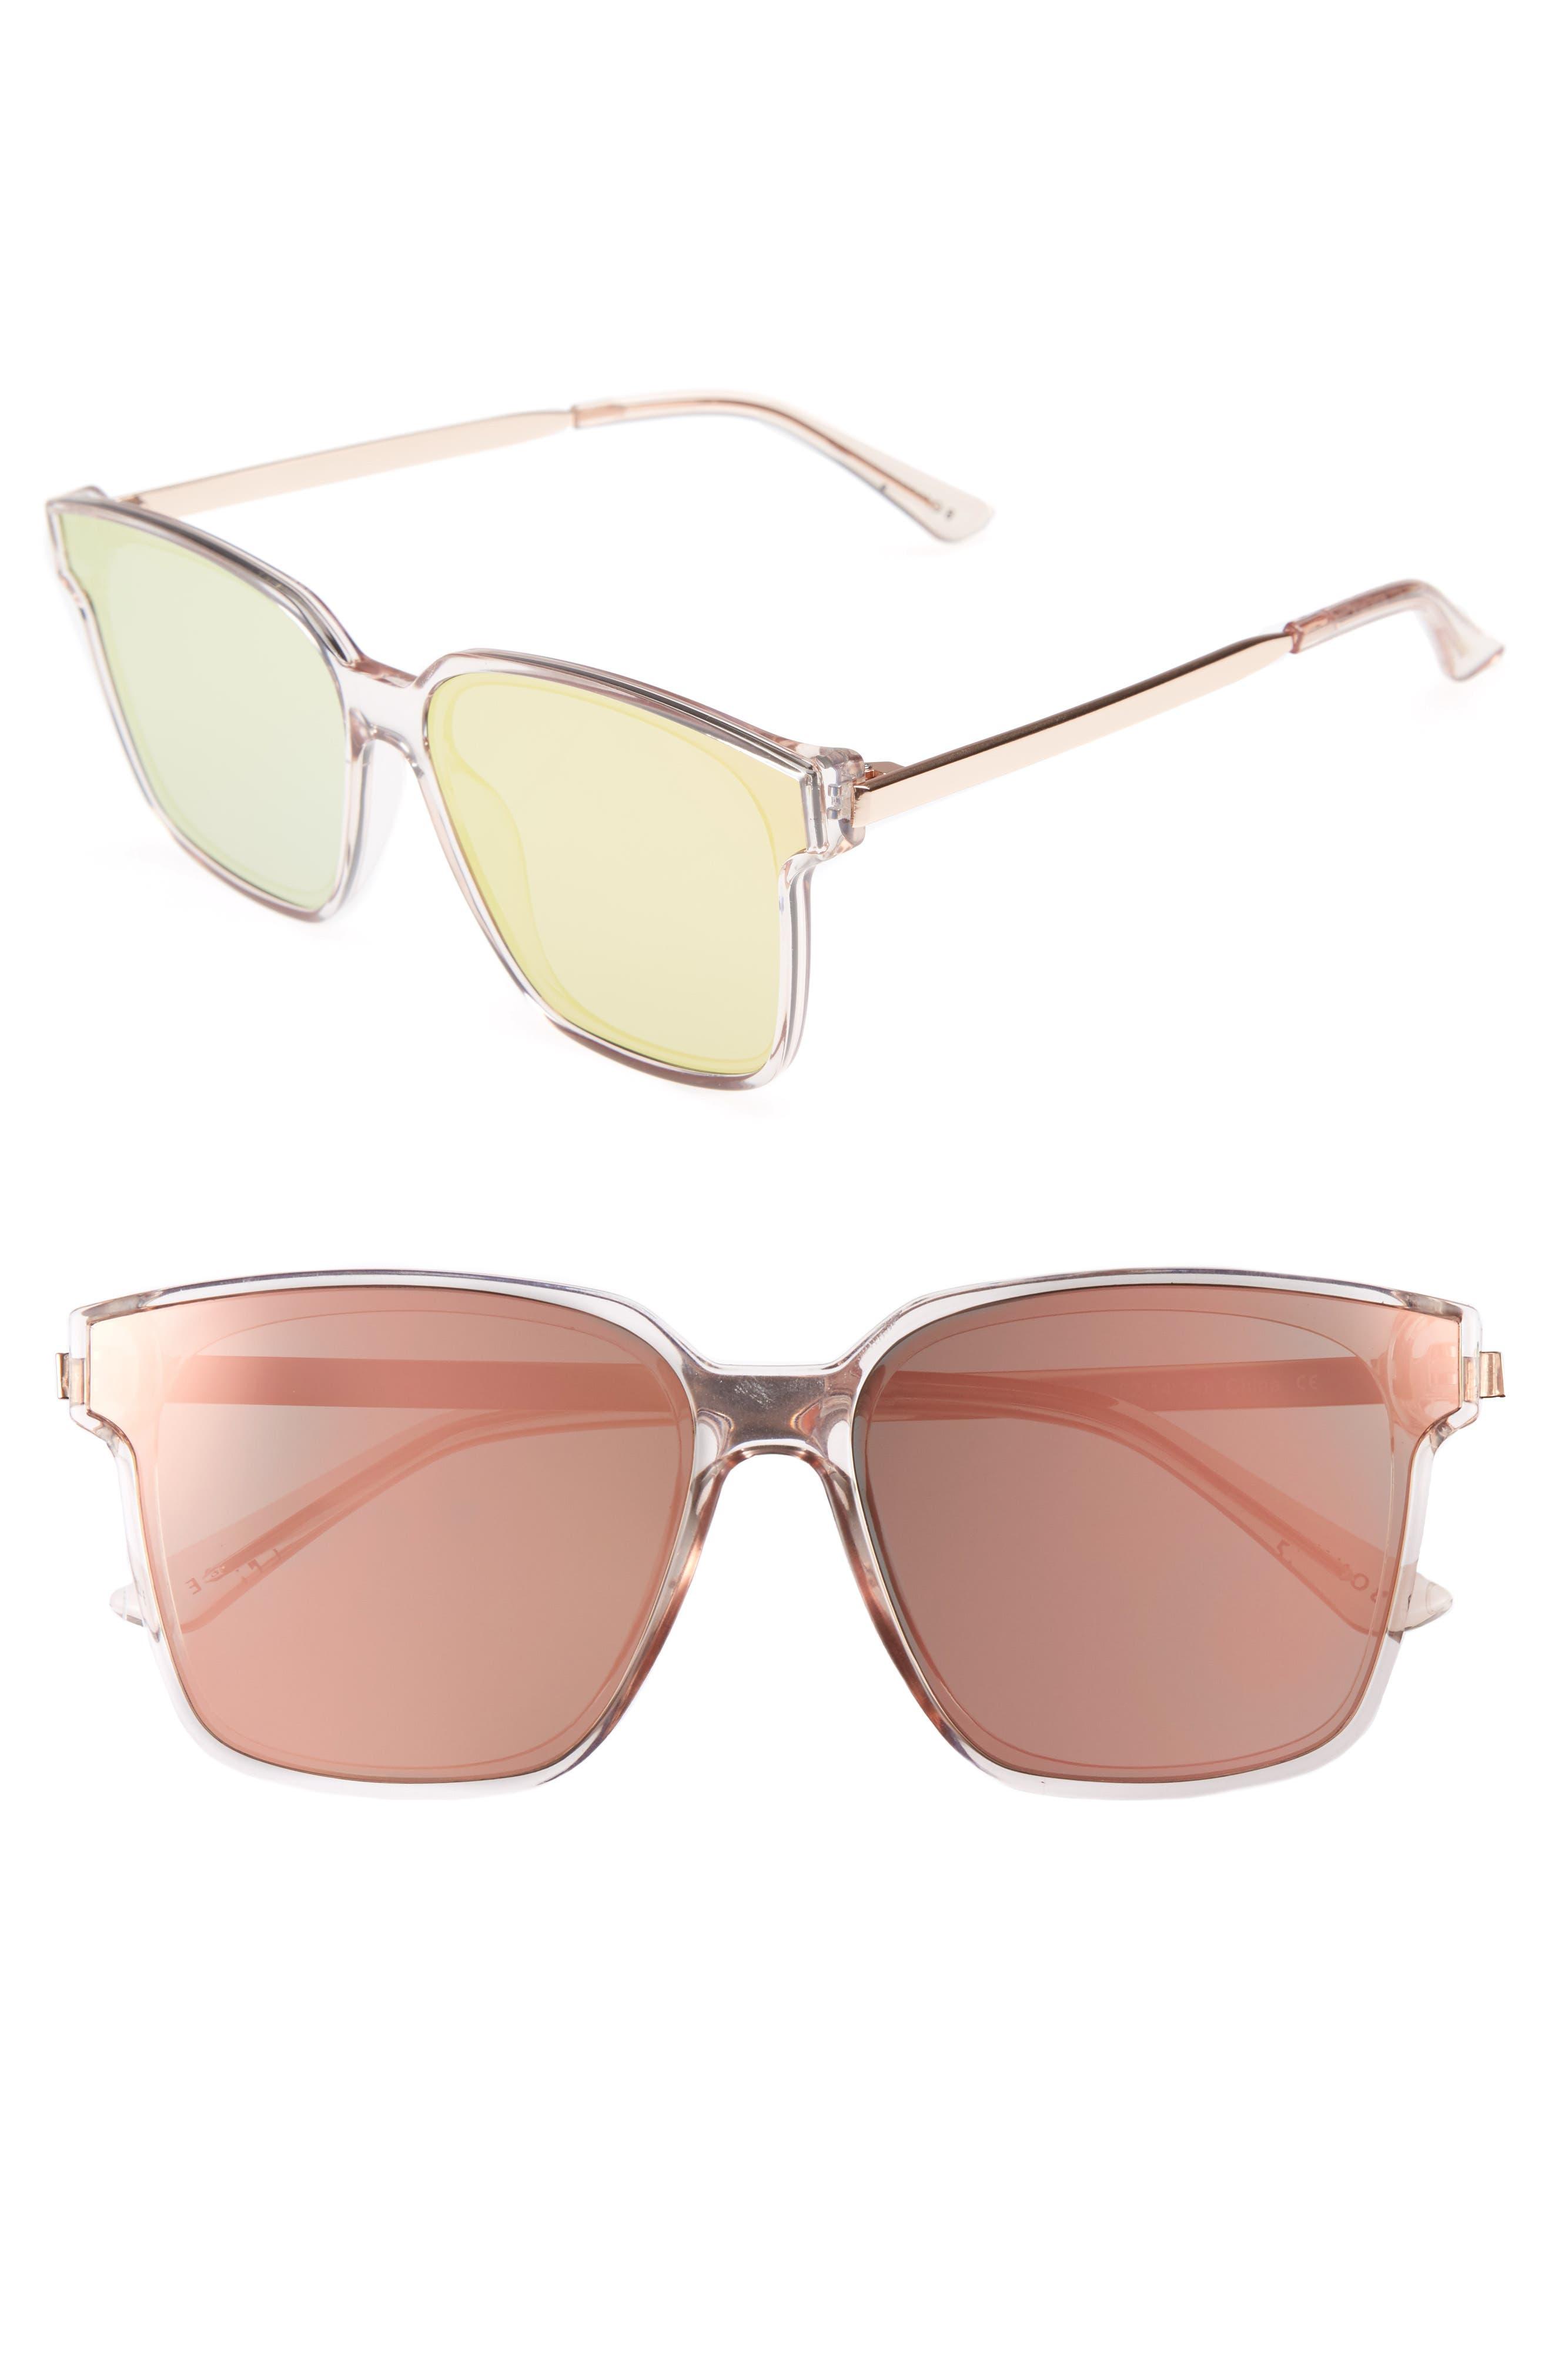 Bonnie Clyde Wall 62mm Square Mirror Lens Sunglasses